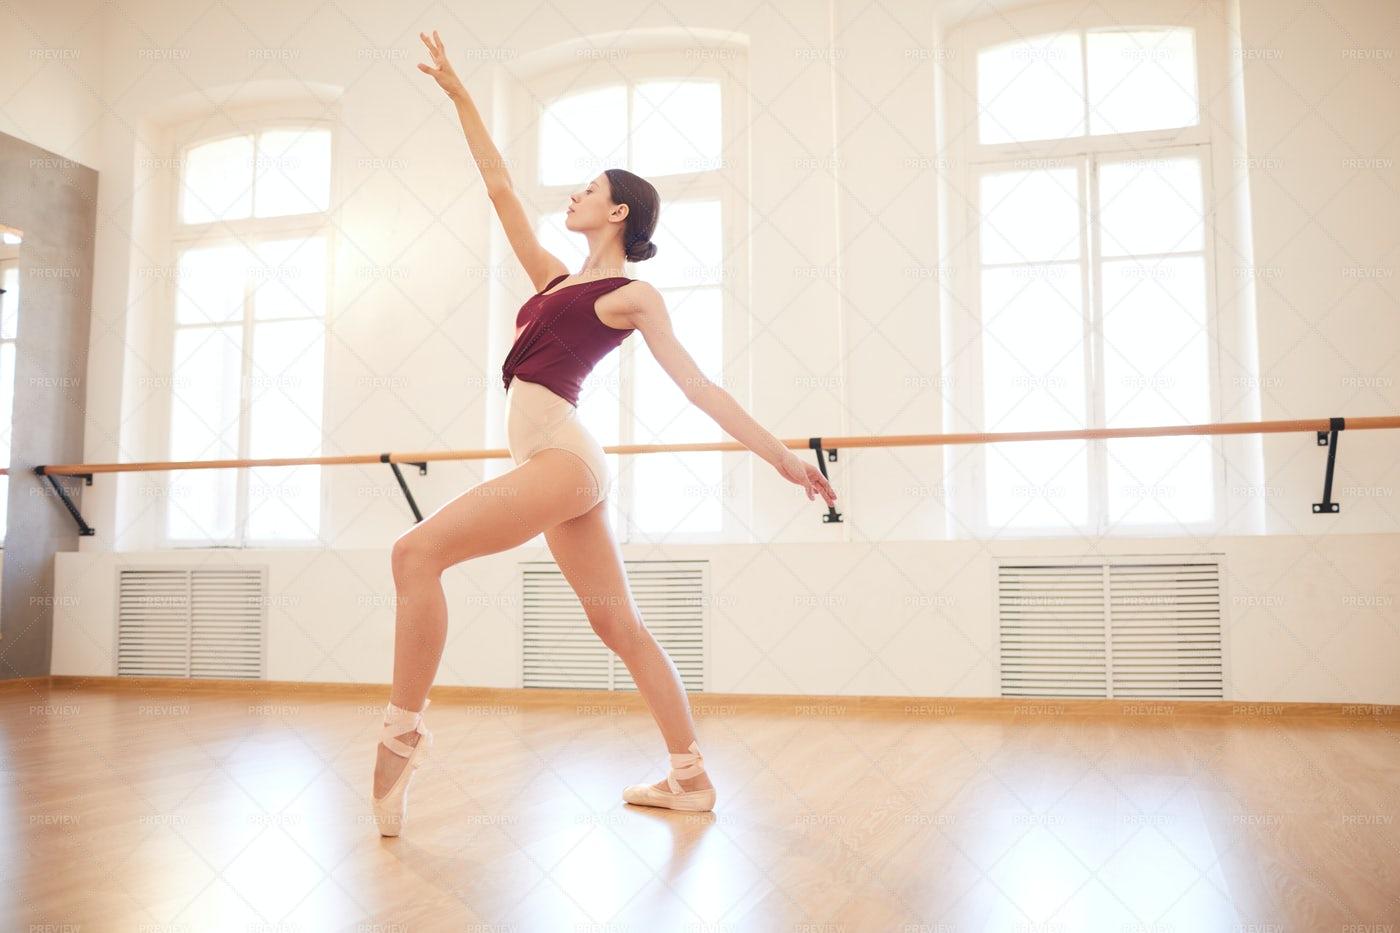 Elegant Woman Dancing In Pointe...: Stock Photos